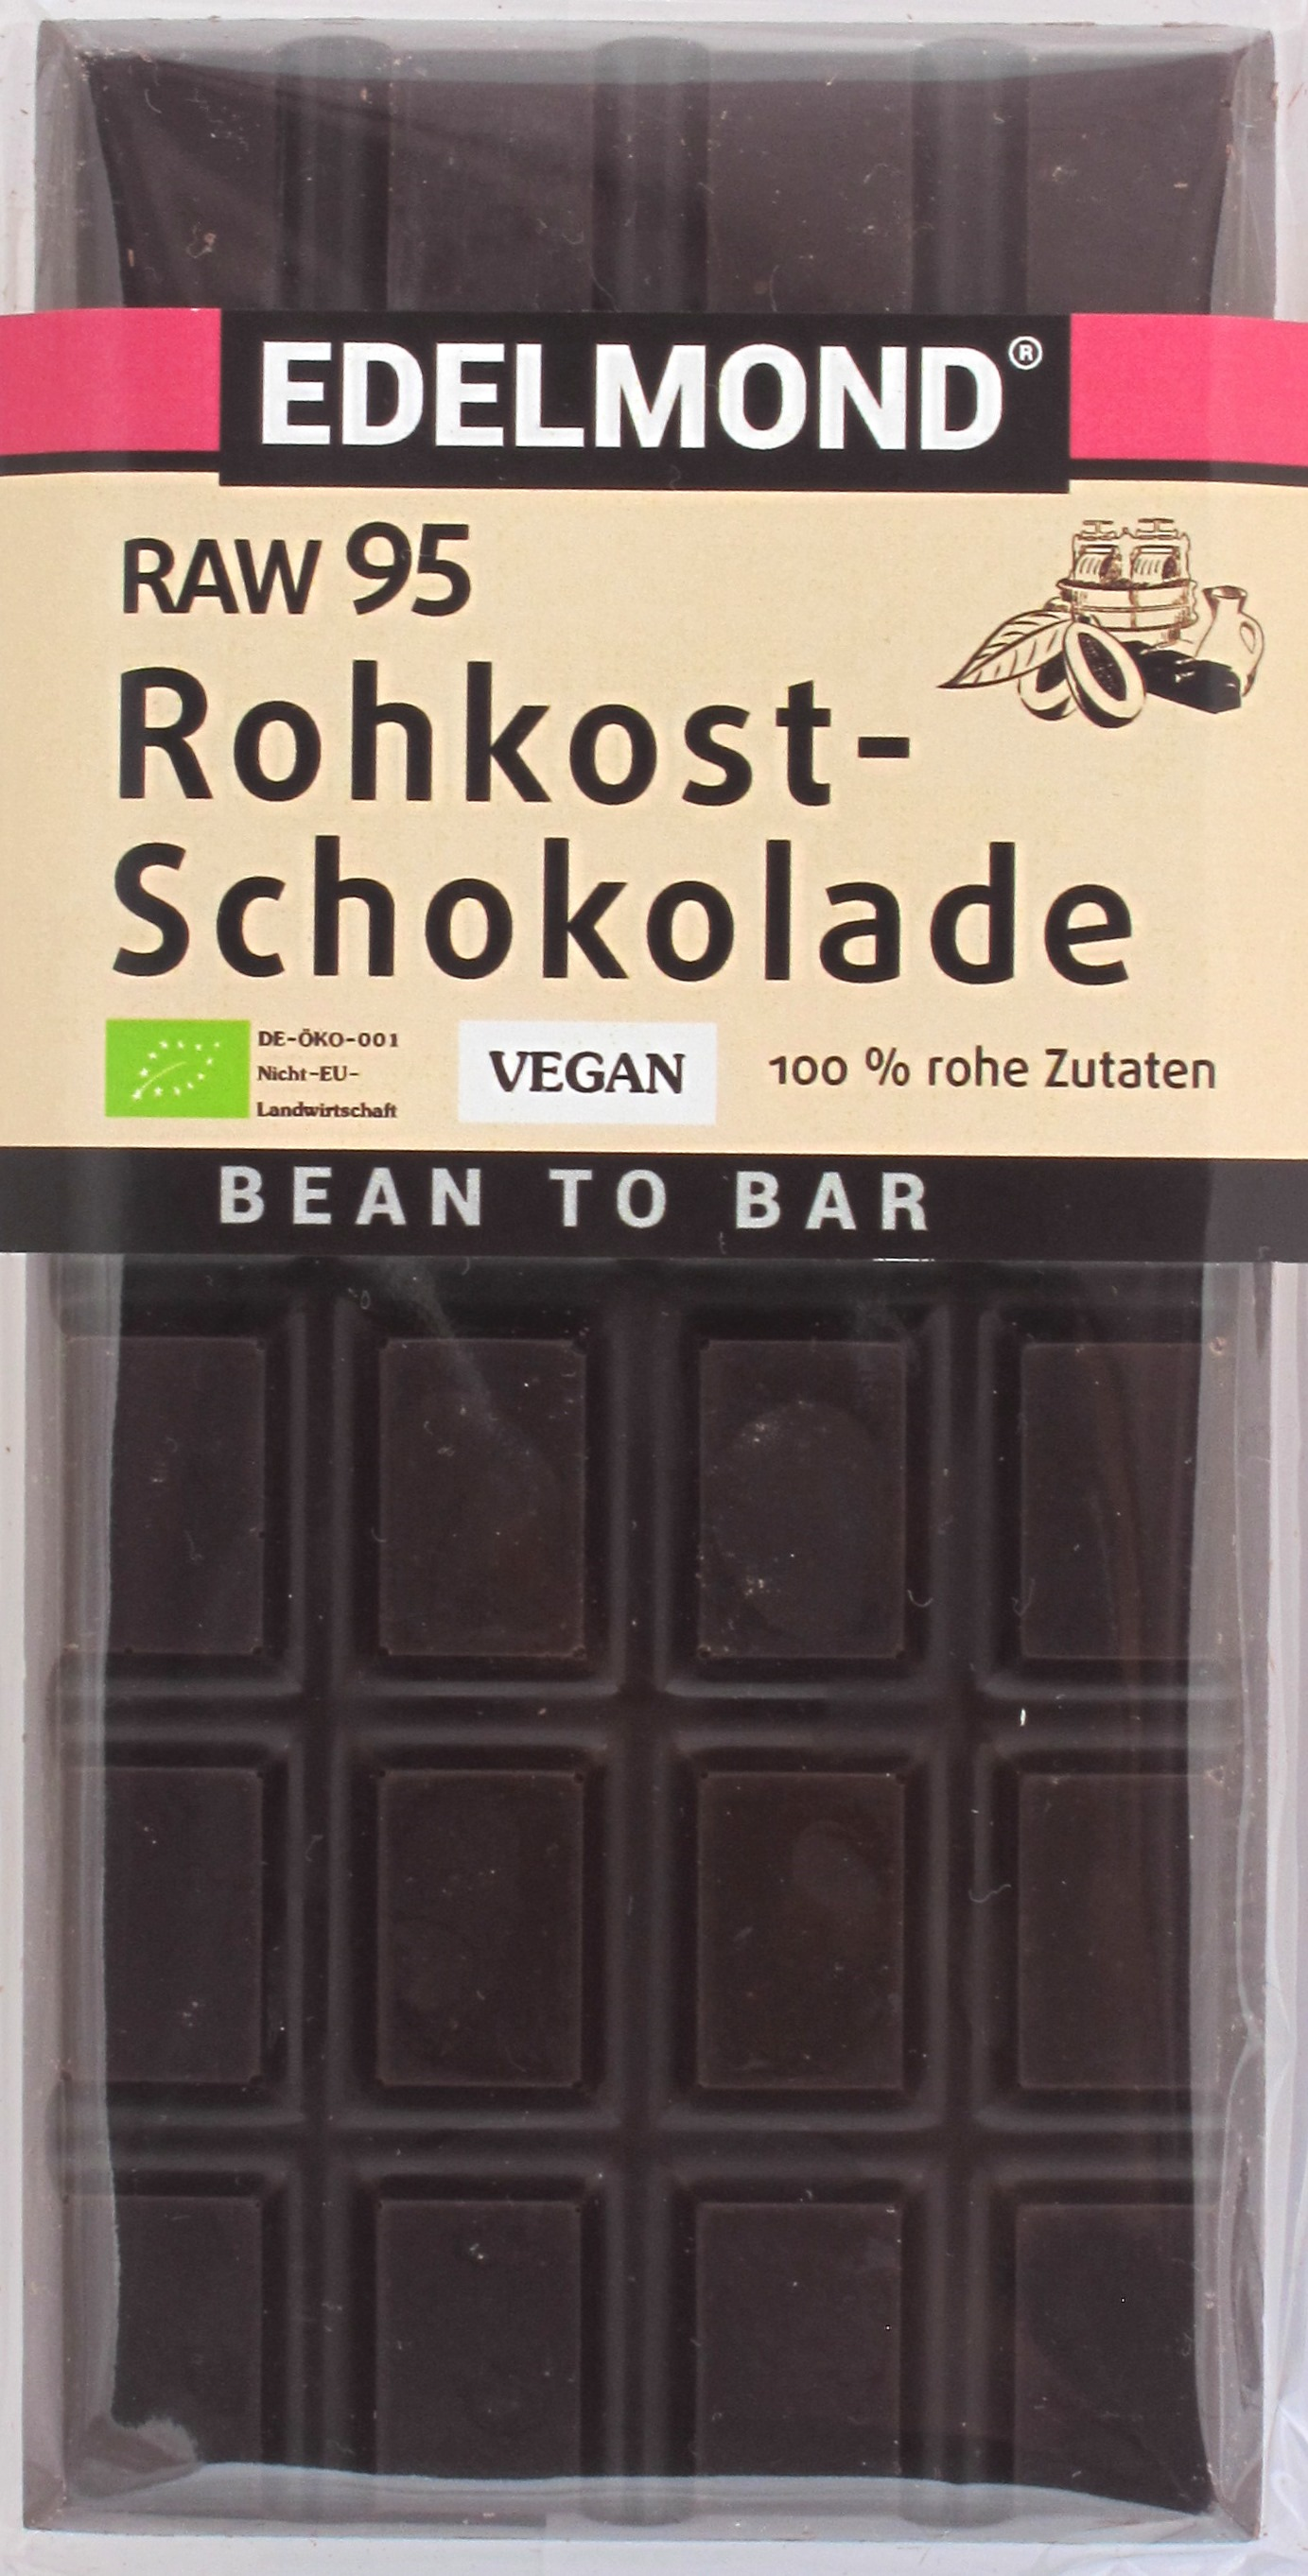 Edelmond 'RAW 95' Bitterschokolade, Cover